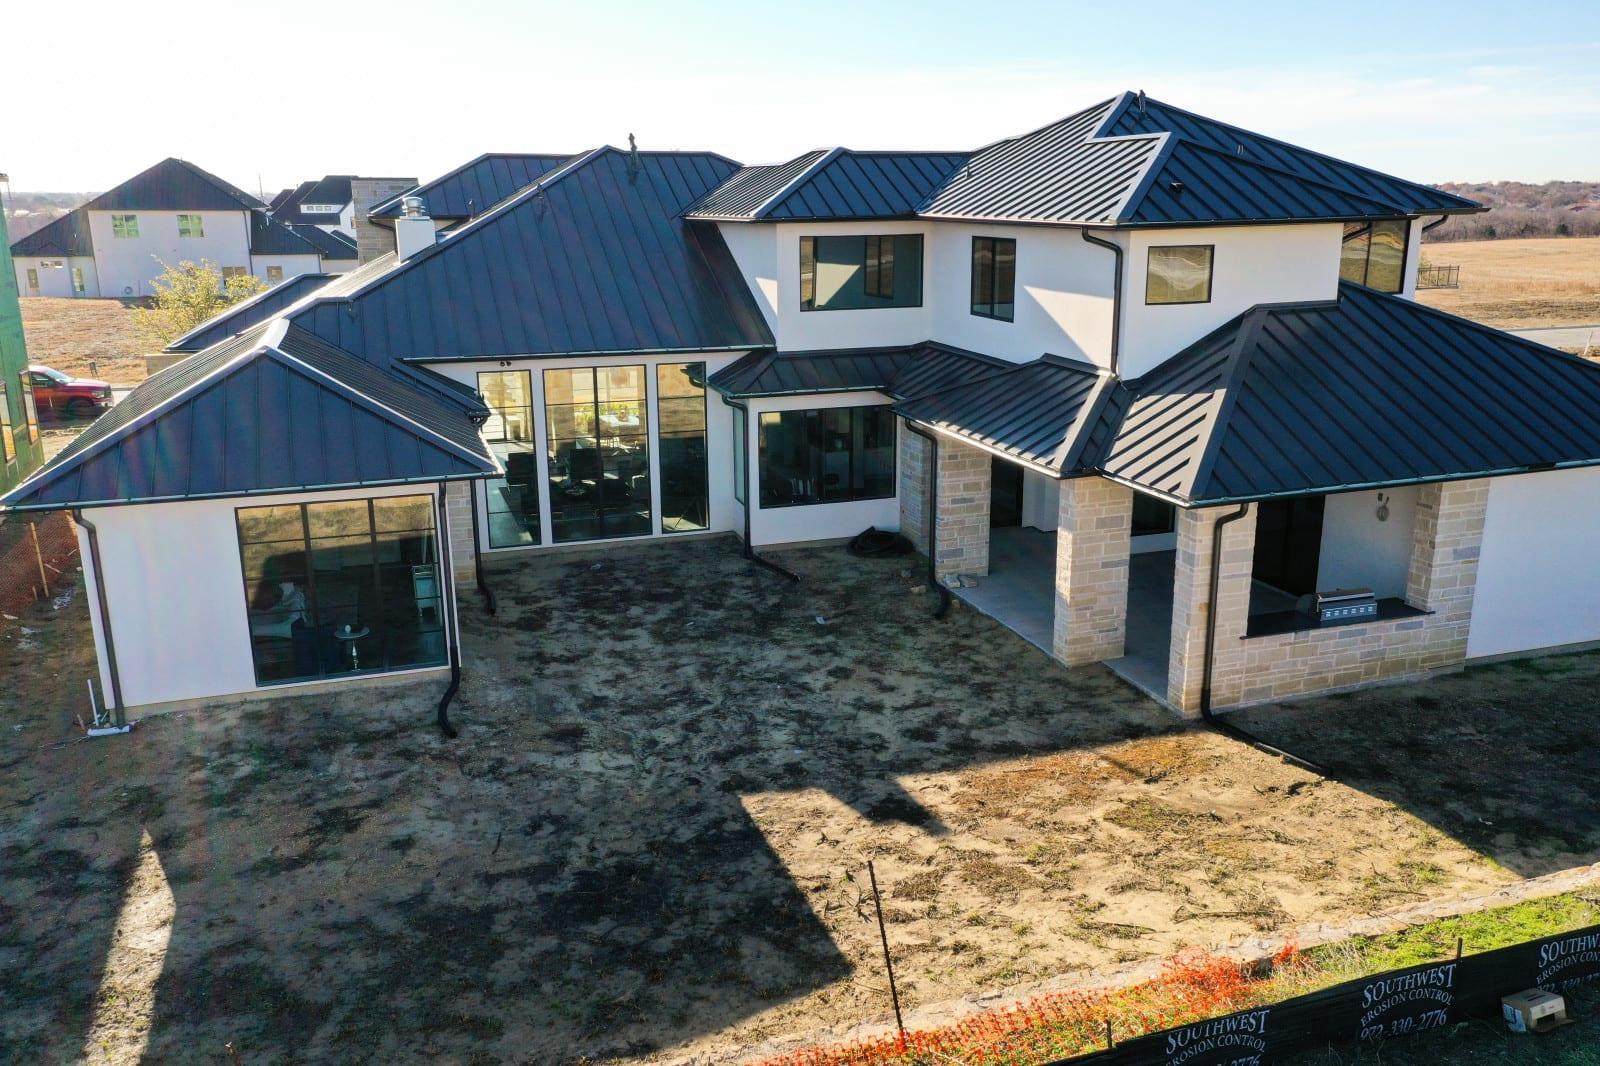 Modern Style Homes design # 4 - Millennial Design + Build